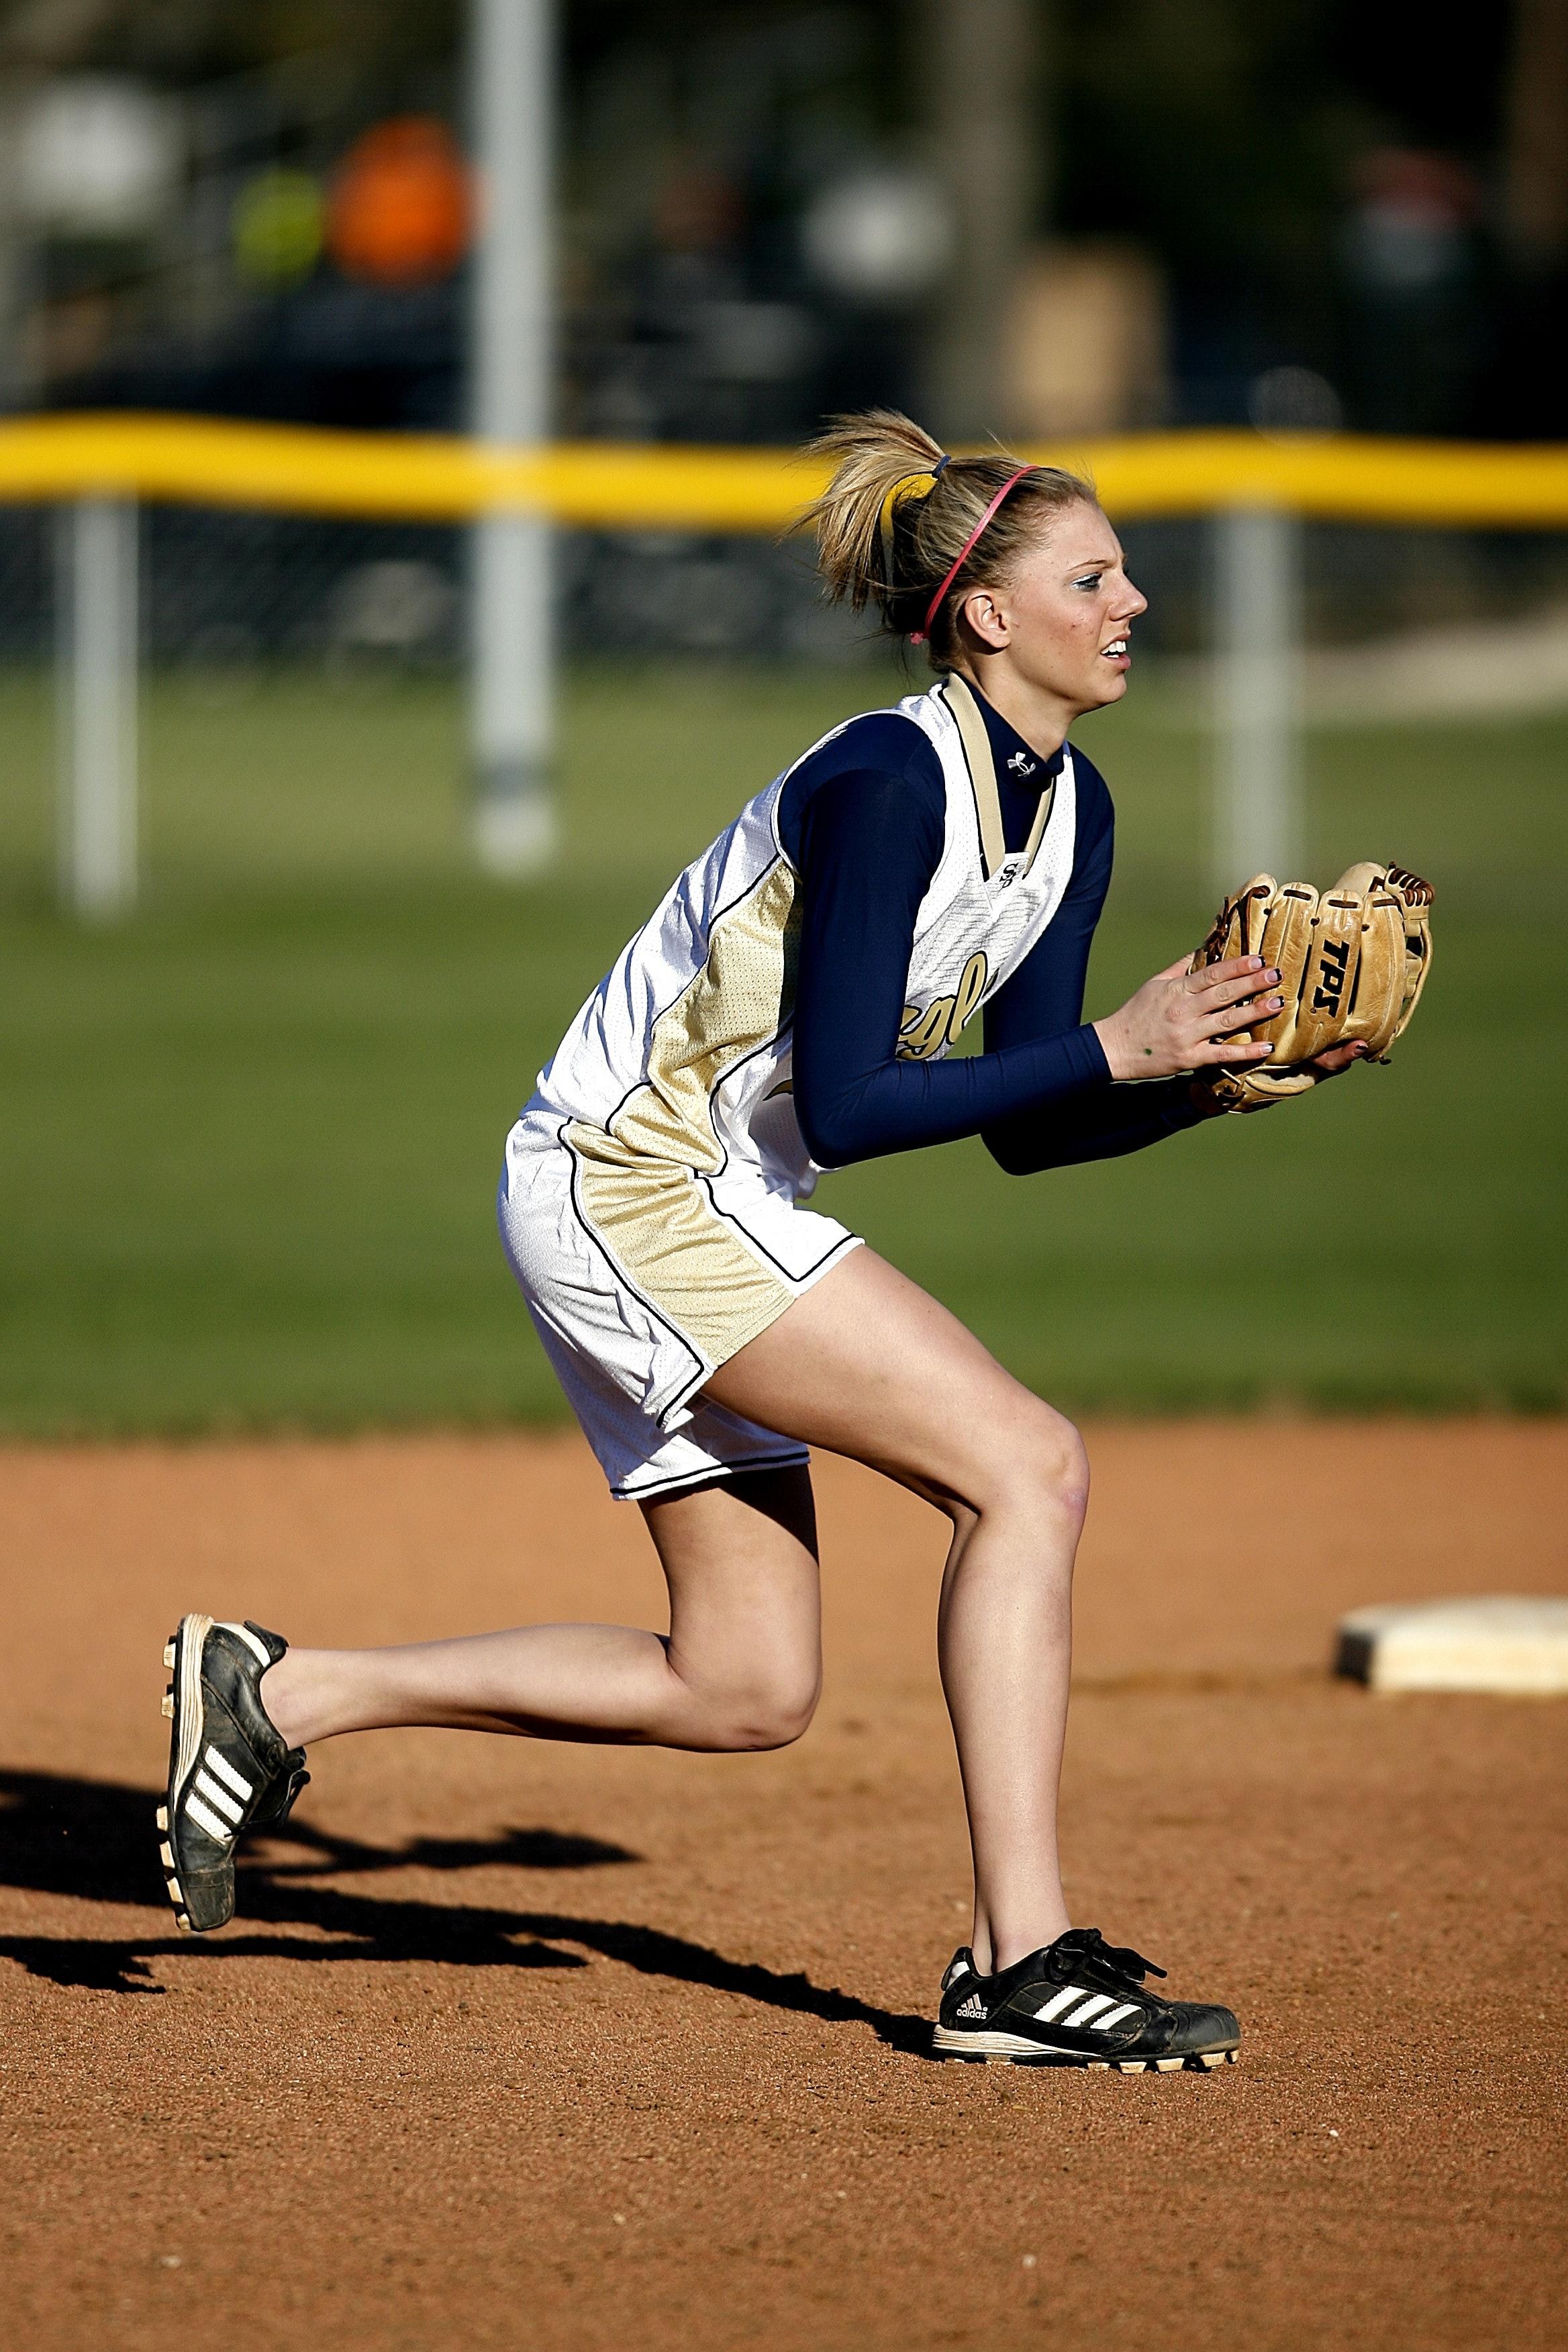 Woman In White Sleeveless Jersey Holding A Black Baseball -8473